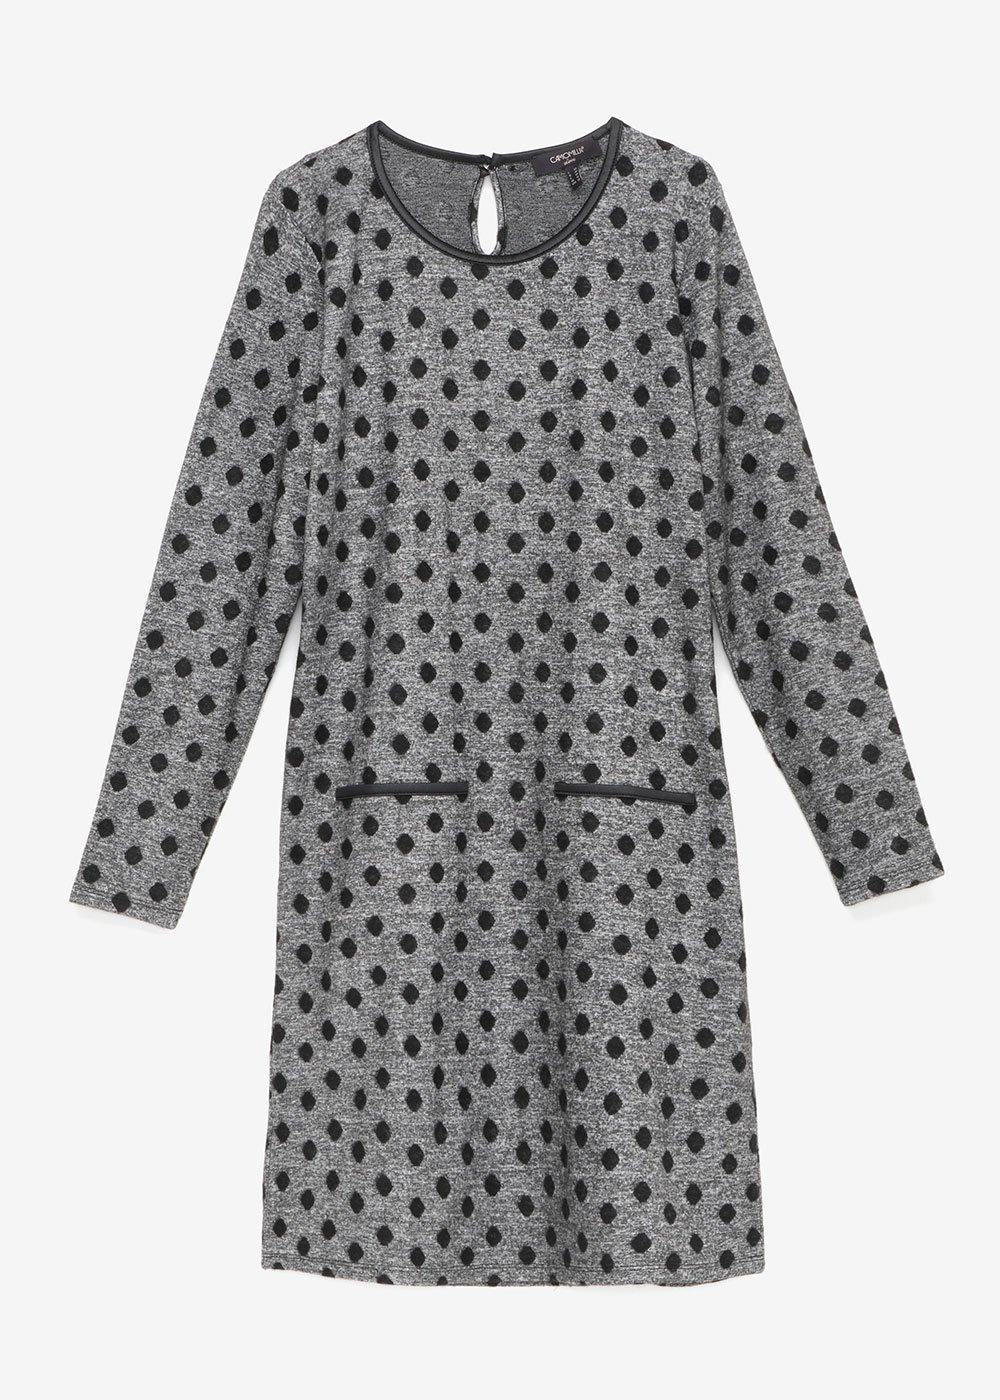 Avryl dress with polka-dot pattern - Black / Grey / Pois - Woman